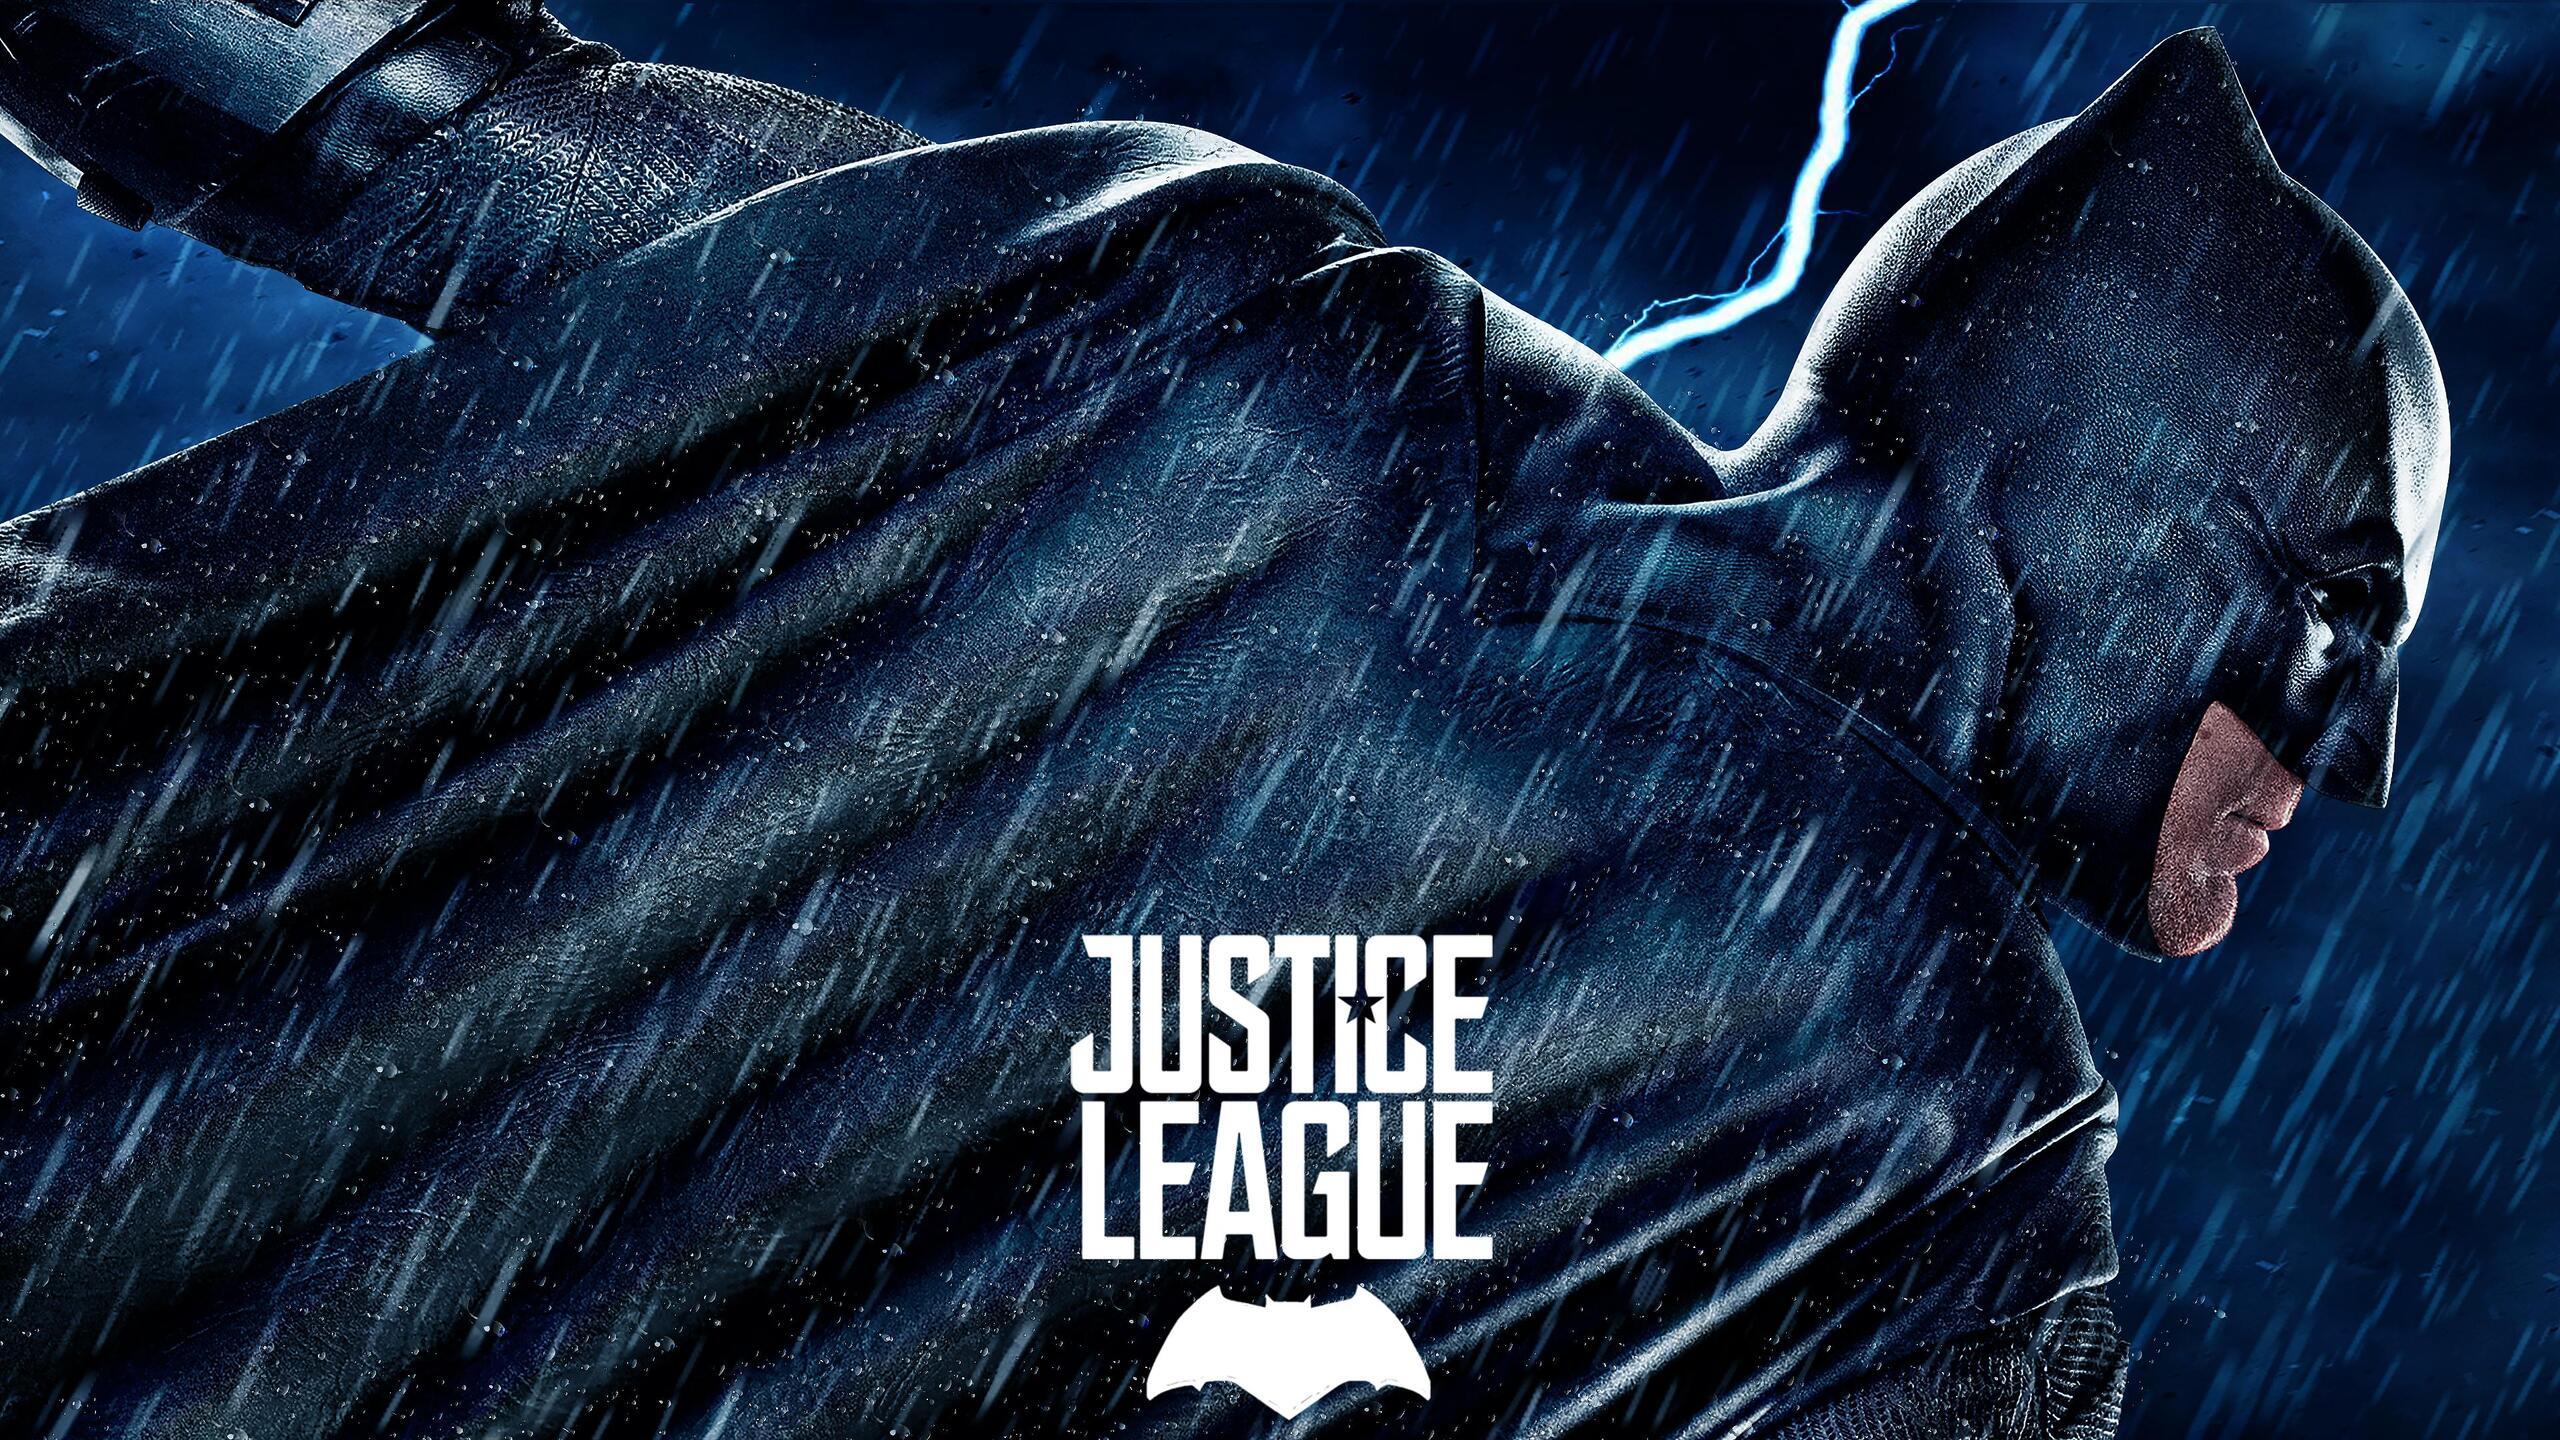 2560x1440 Batman Justice League 4k 2017 1440p Resolution Hd